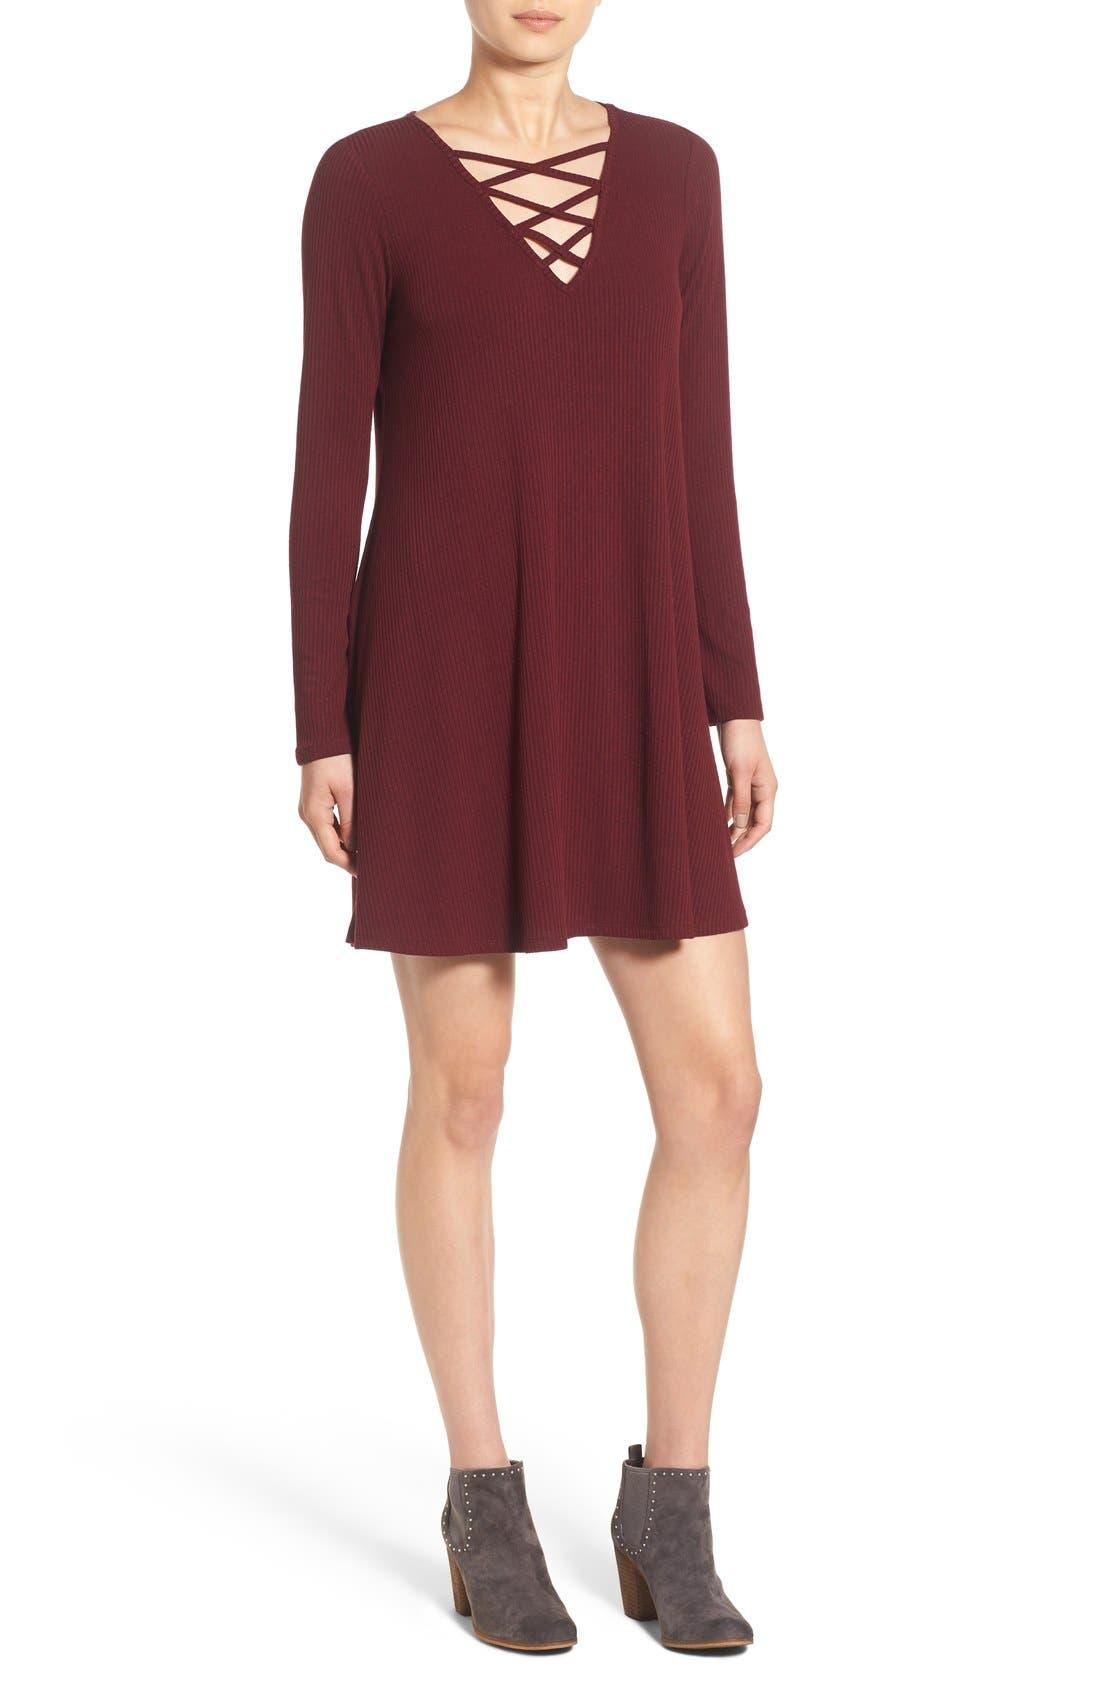 Main Image - Love, Fire Long Sleeve Rib Knit Dress